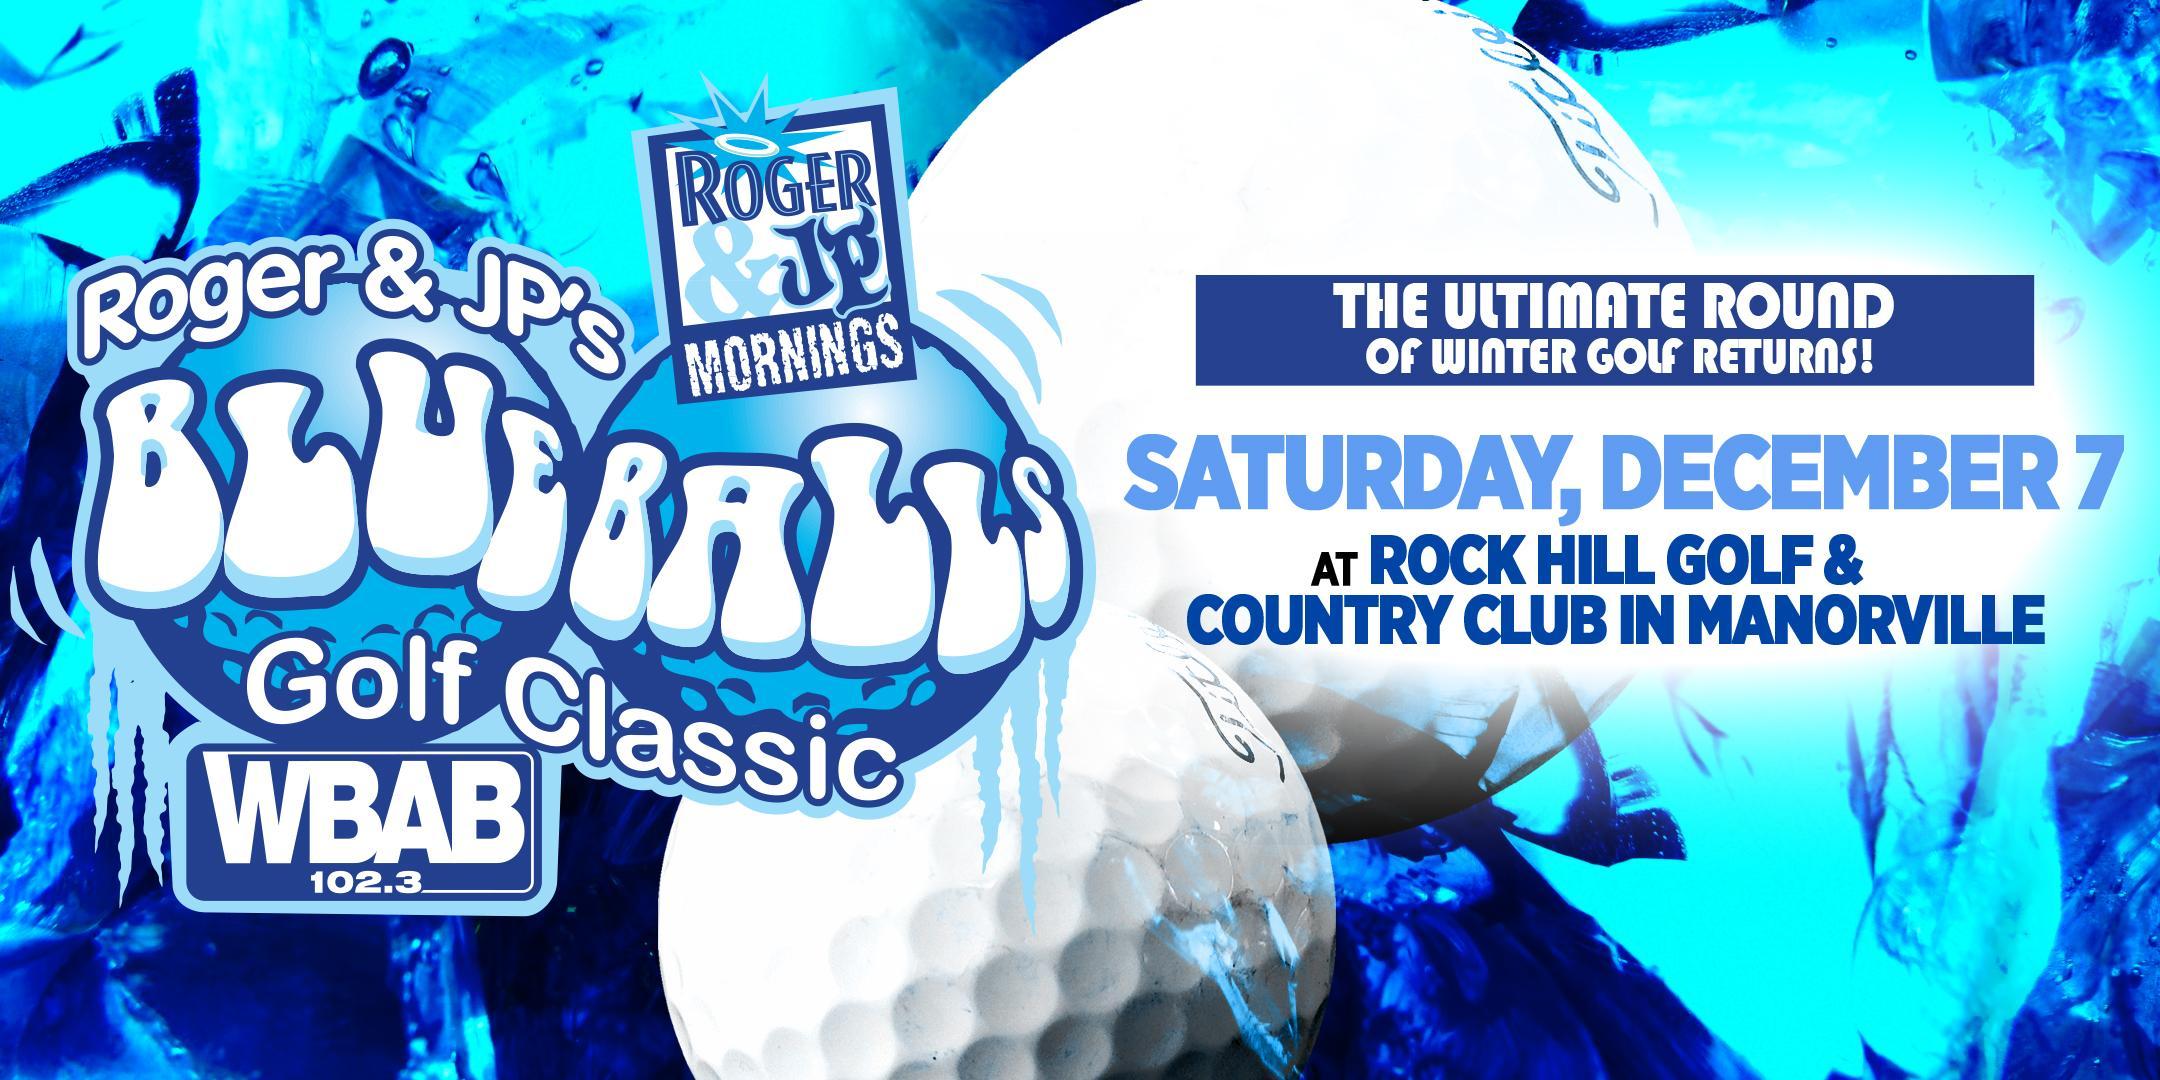 Roger & JP's WBAB Blue Balls Golf Classic